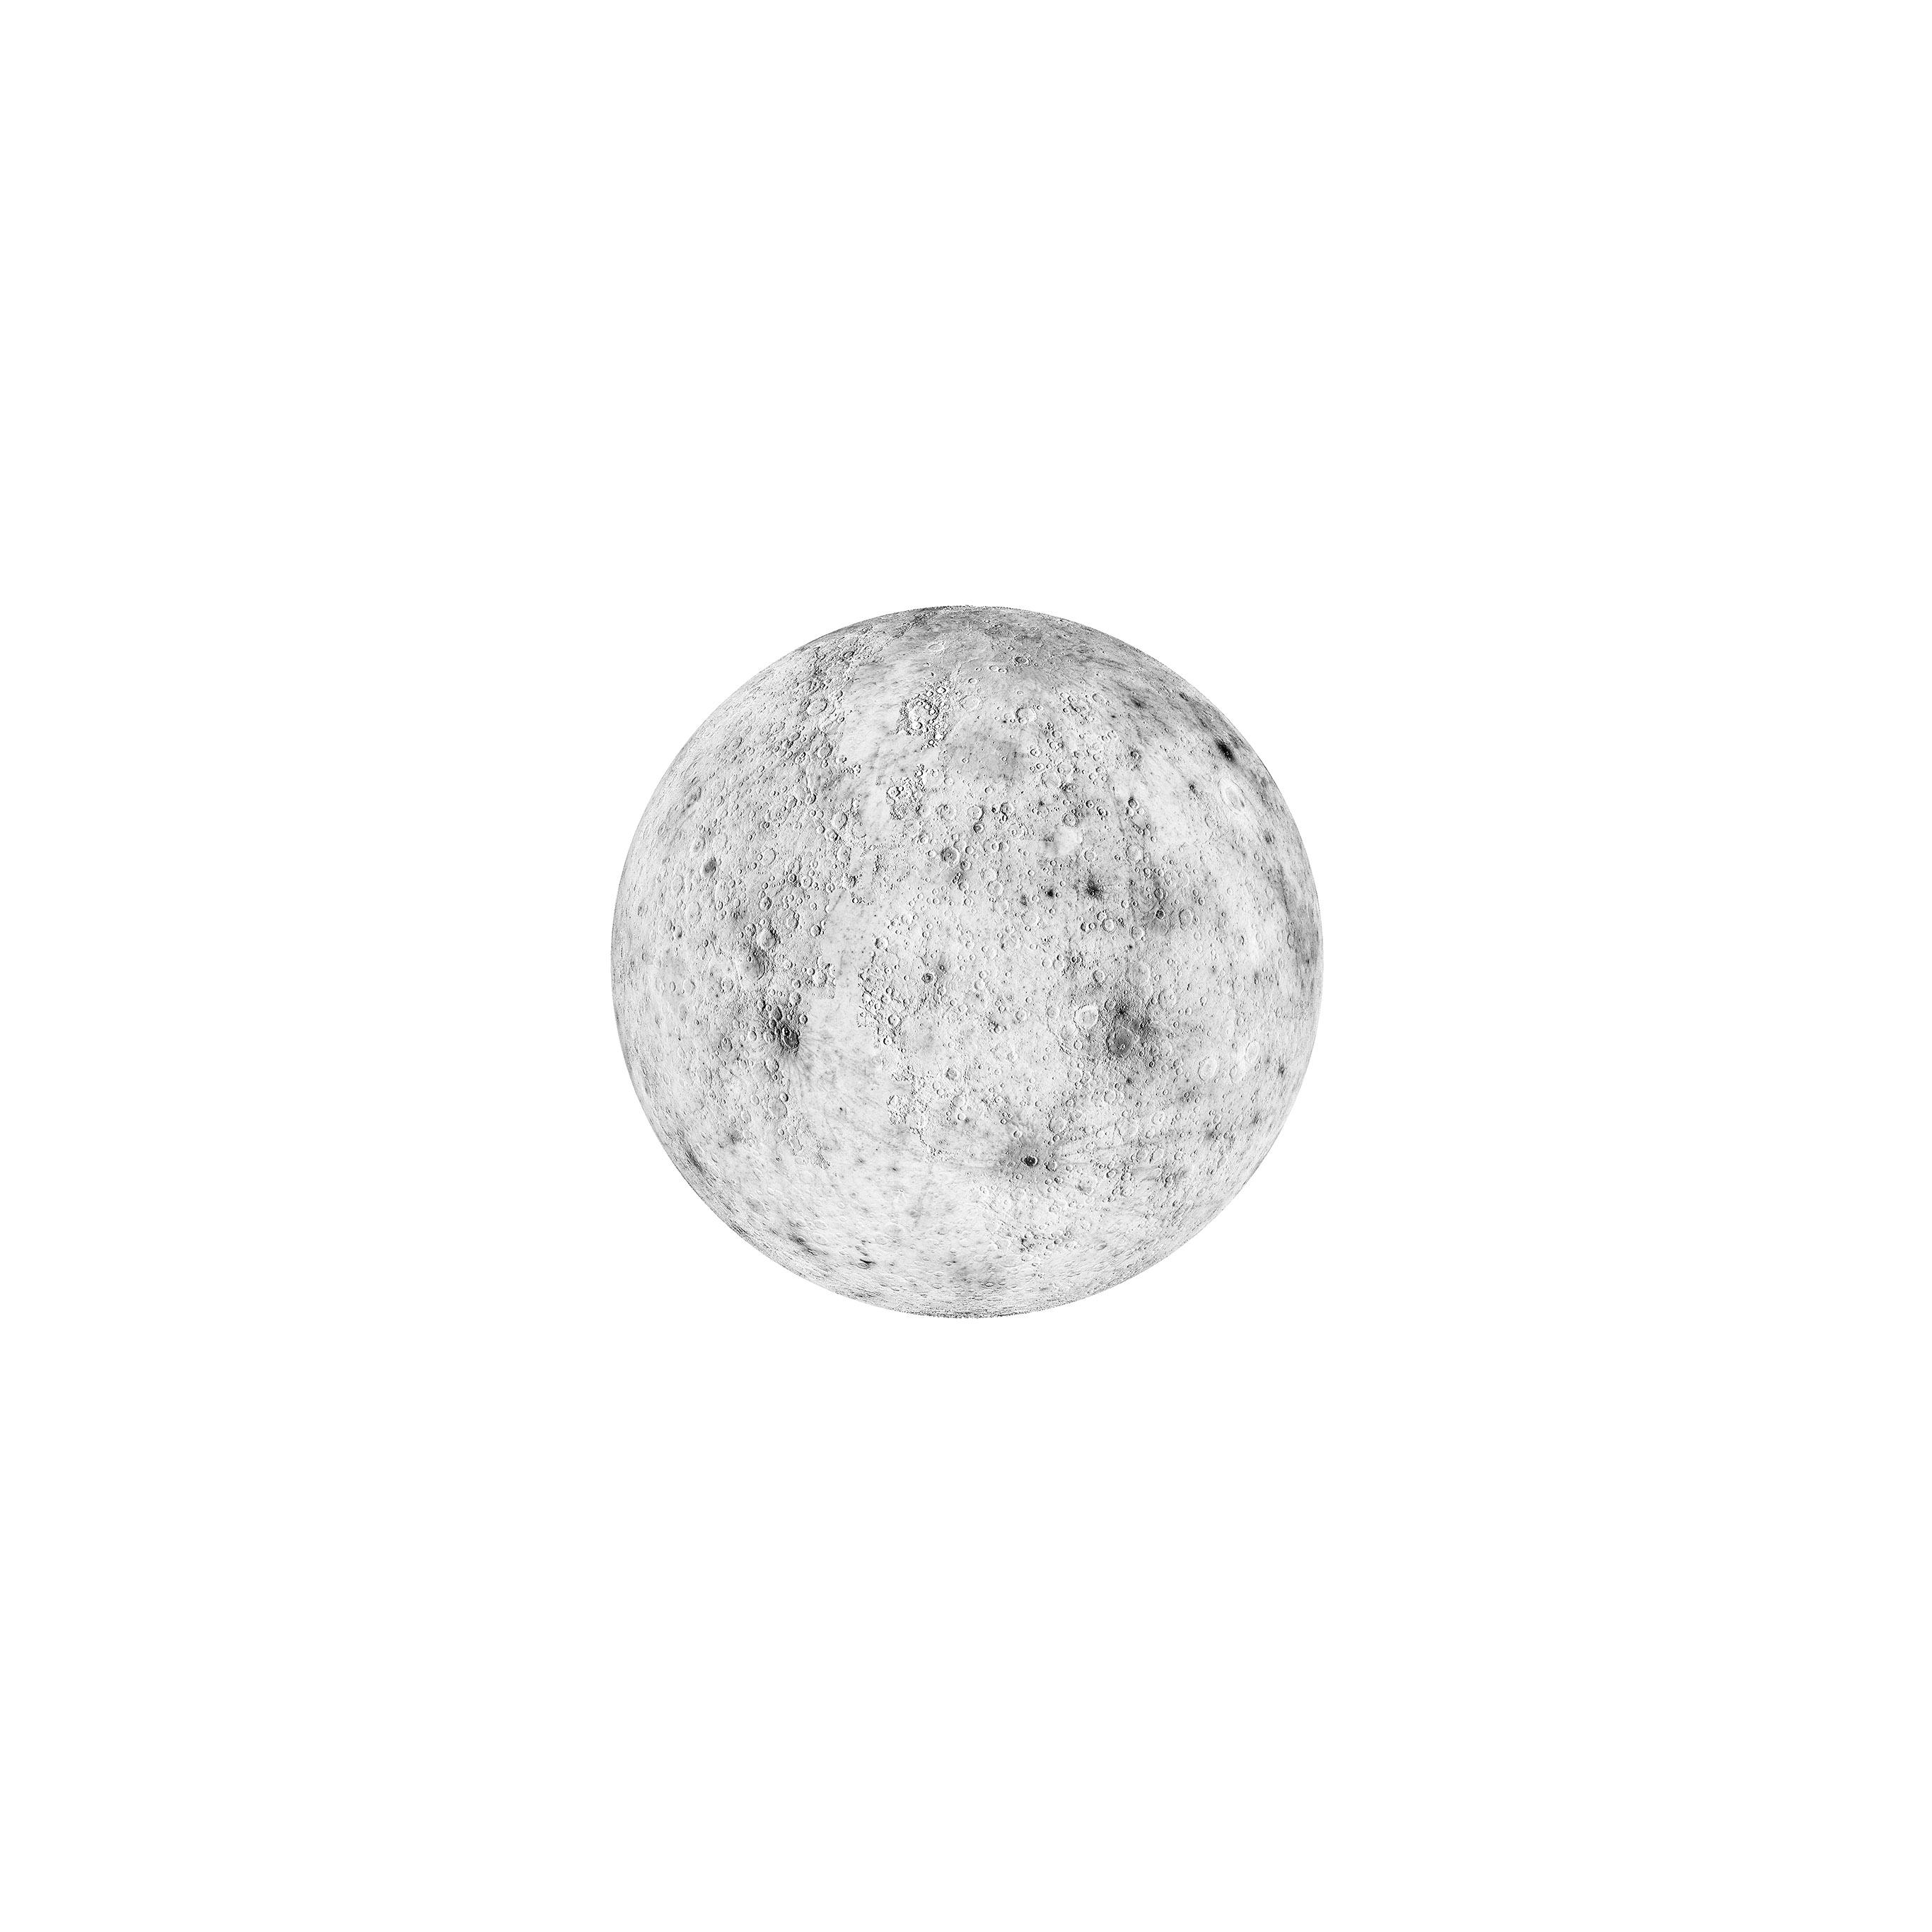 Ar09 Moon White Minimal Art Space Planet Wallpaper